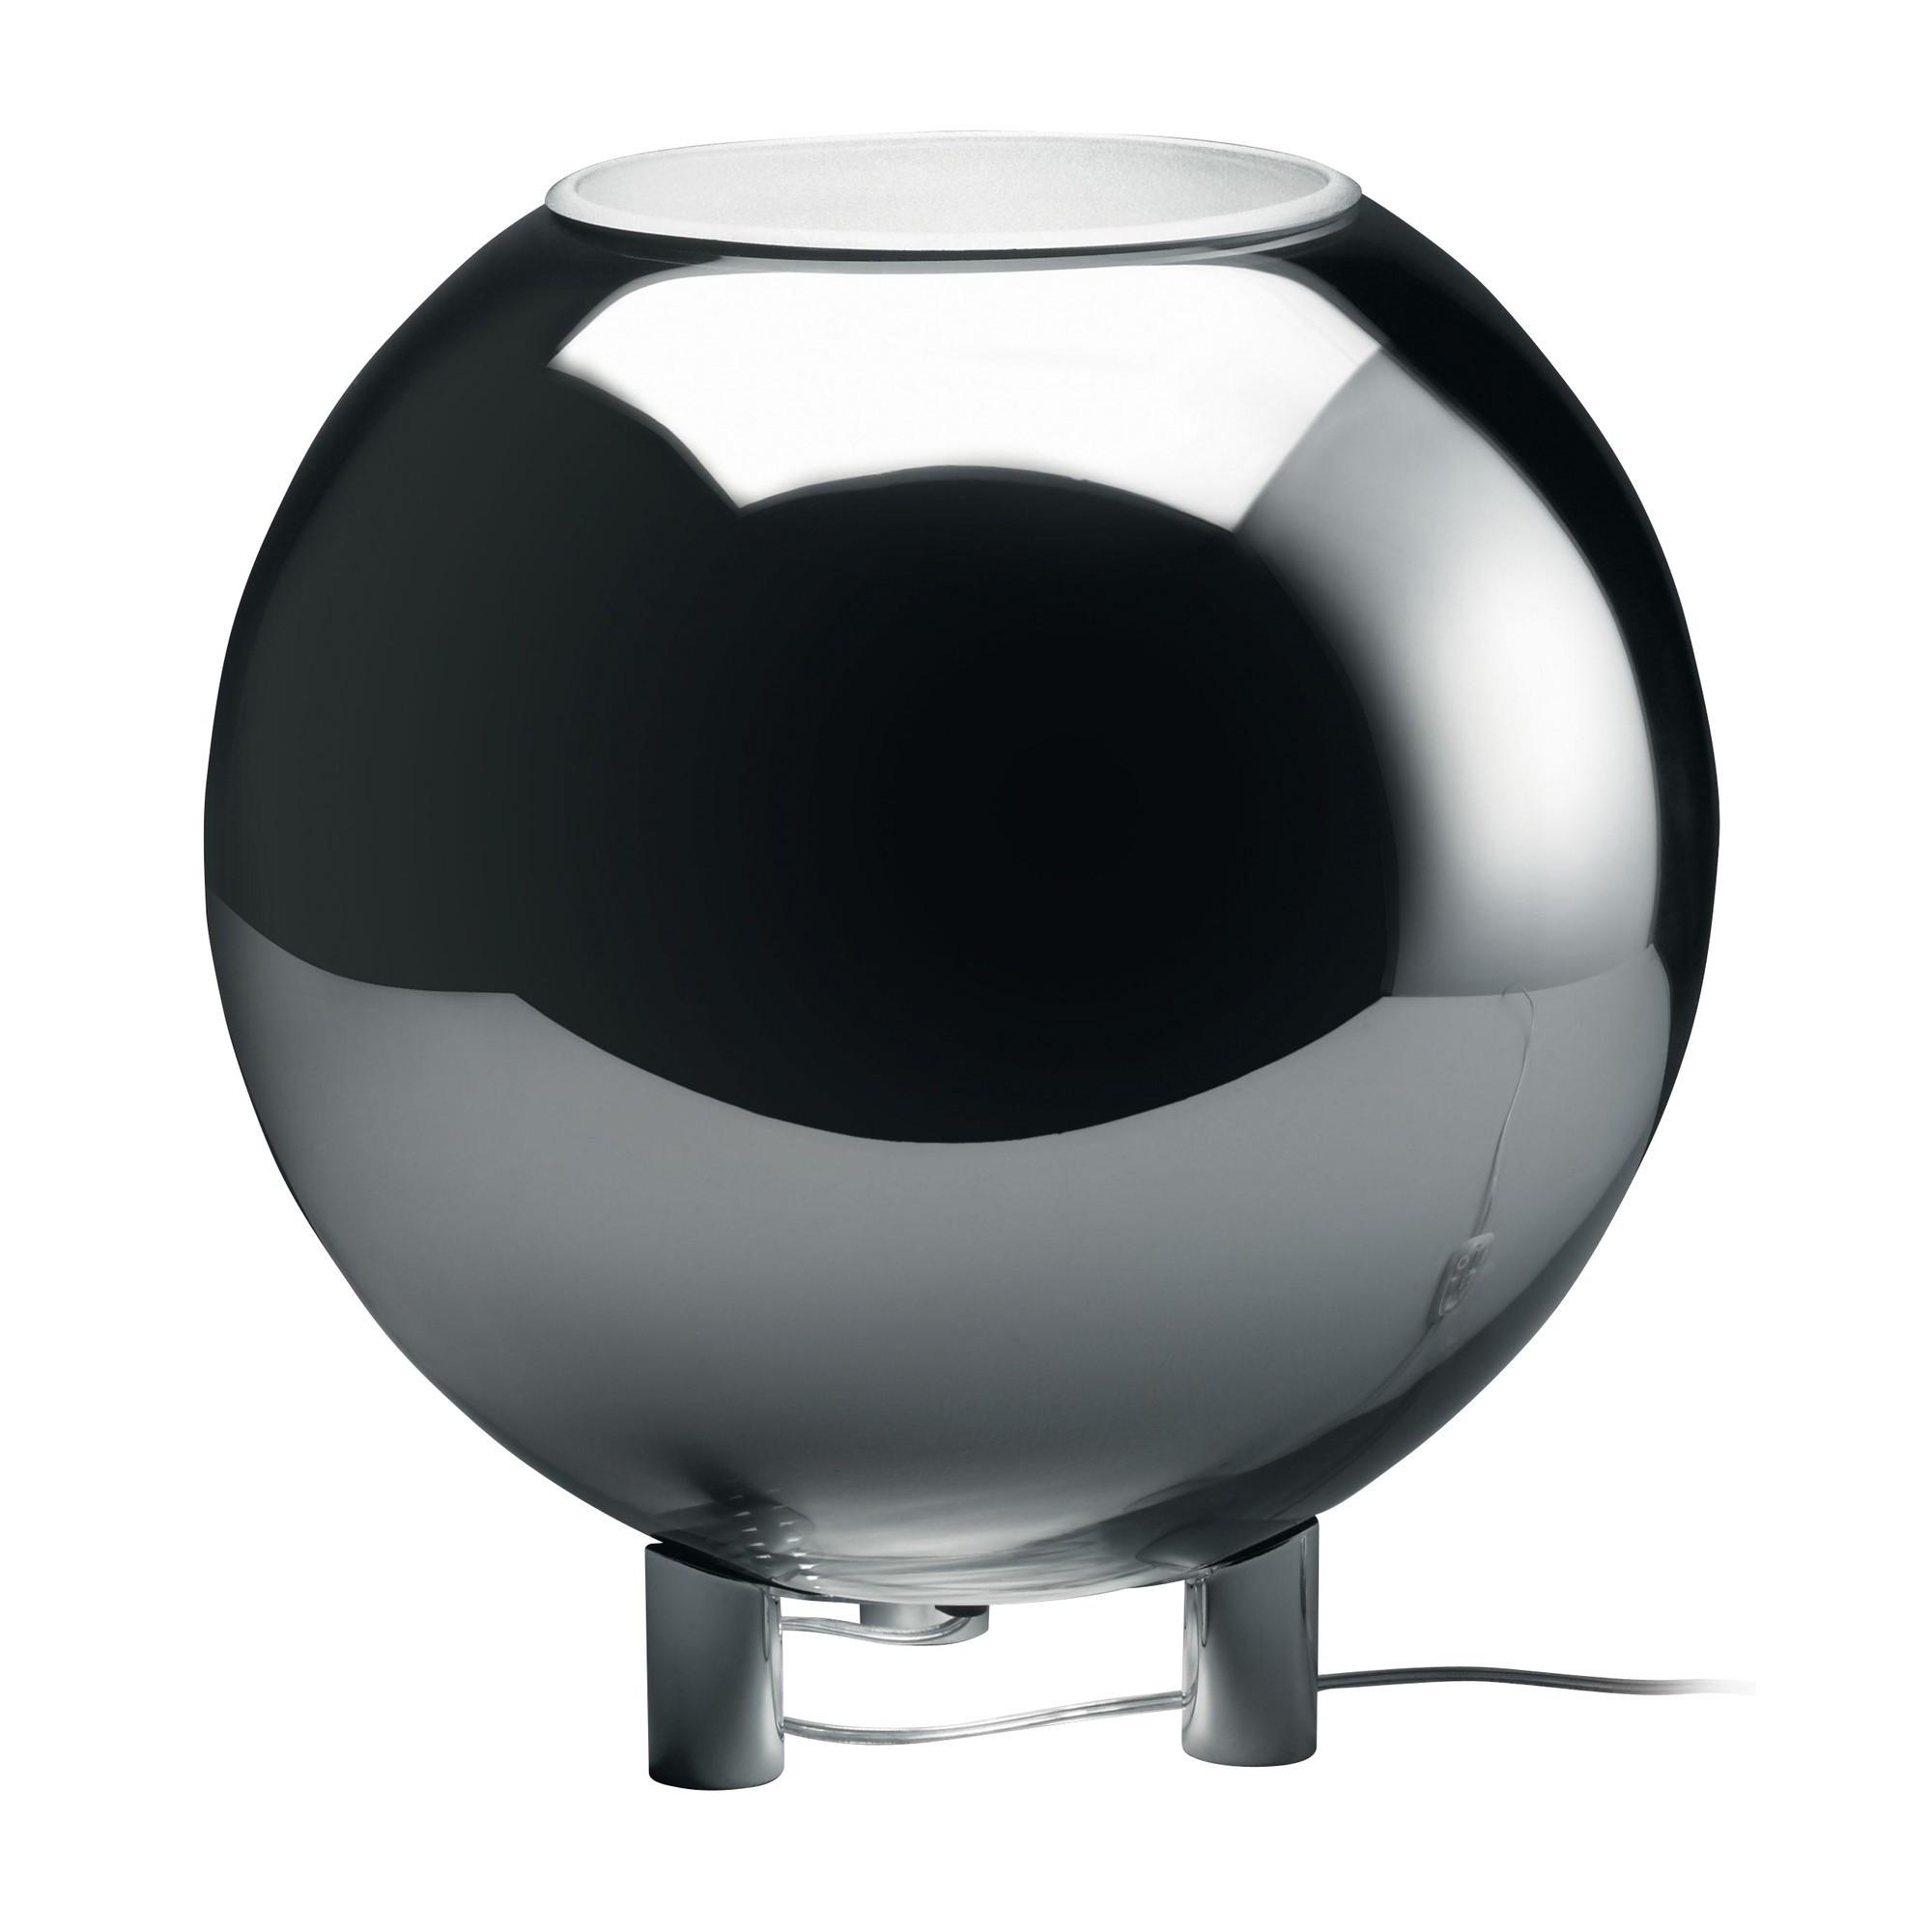 Soccer Ball Vase Of Fontana Arte Globo Di Luce Tavolo Table Lamp Ambientedirect Pertaining to Fontana Arte Globo Di Luce Tavolo